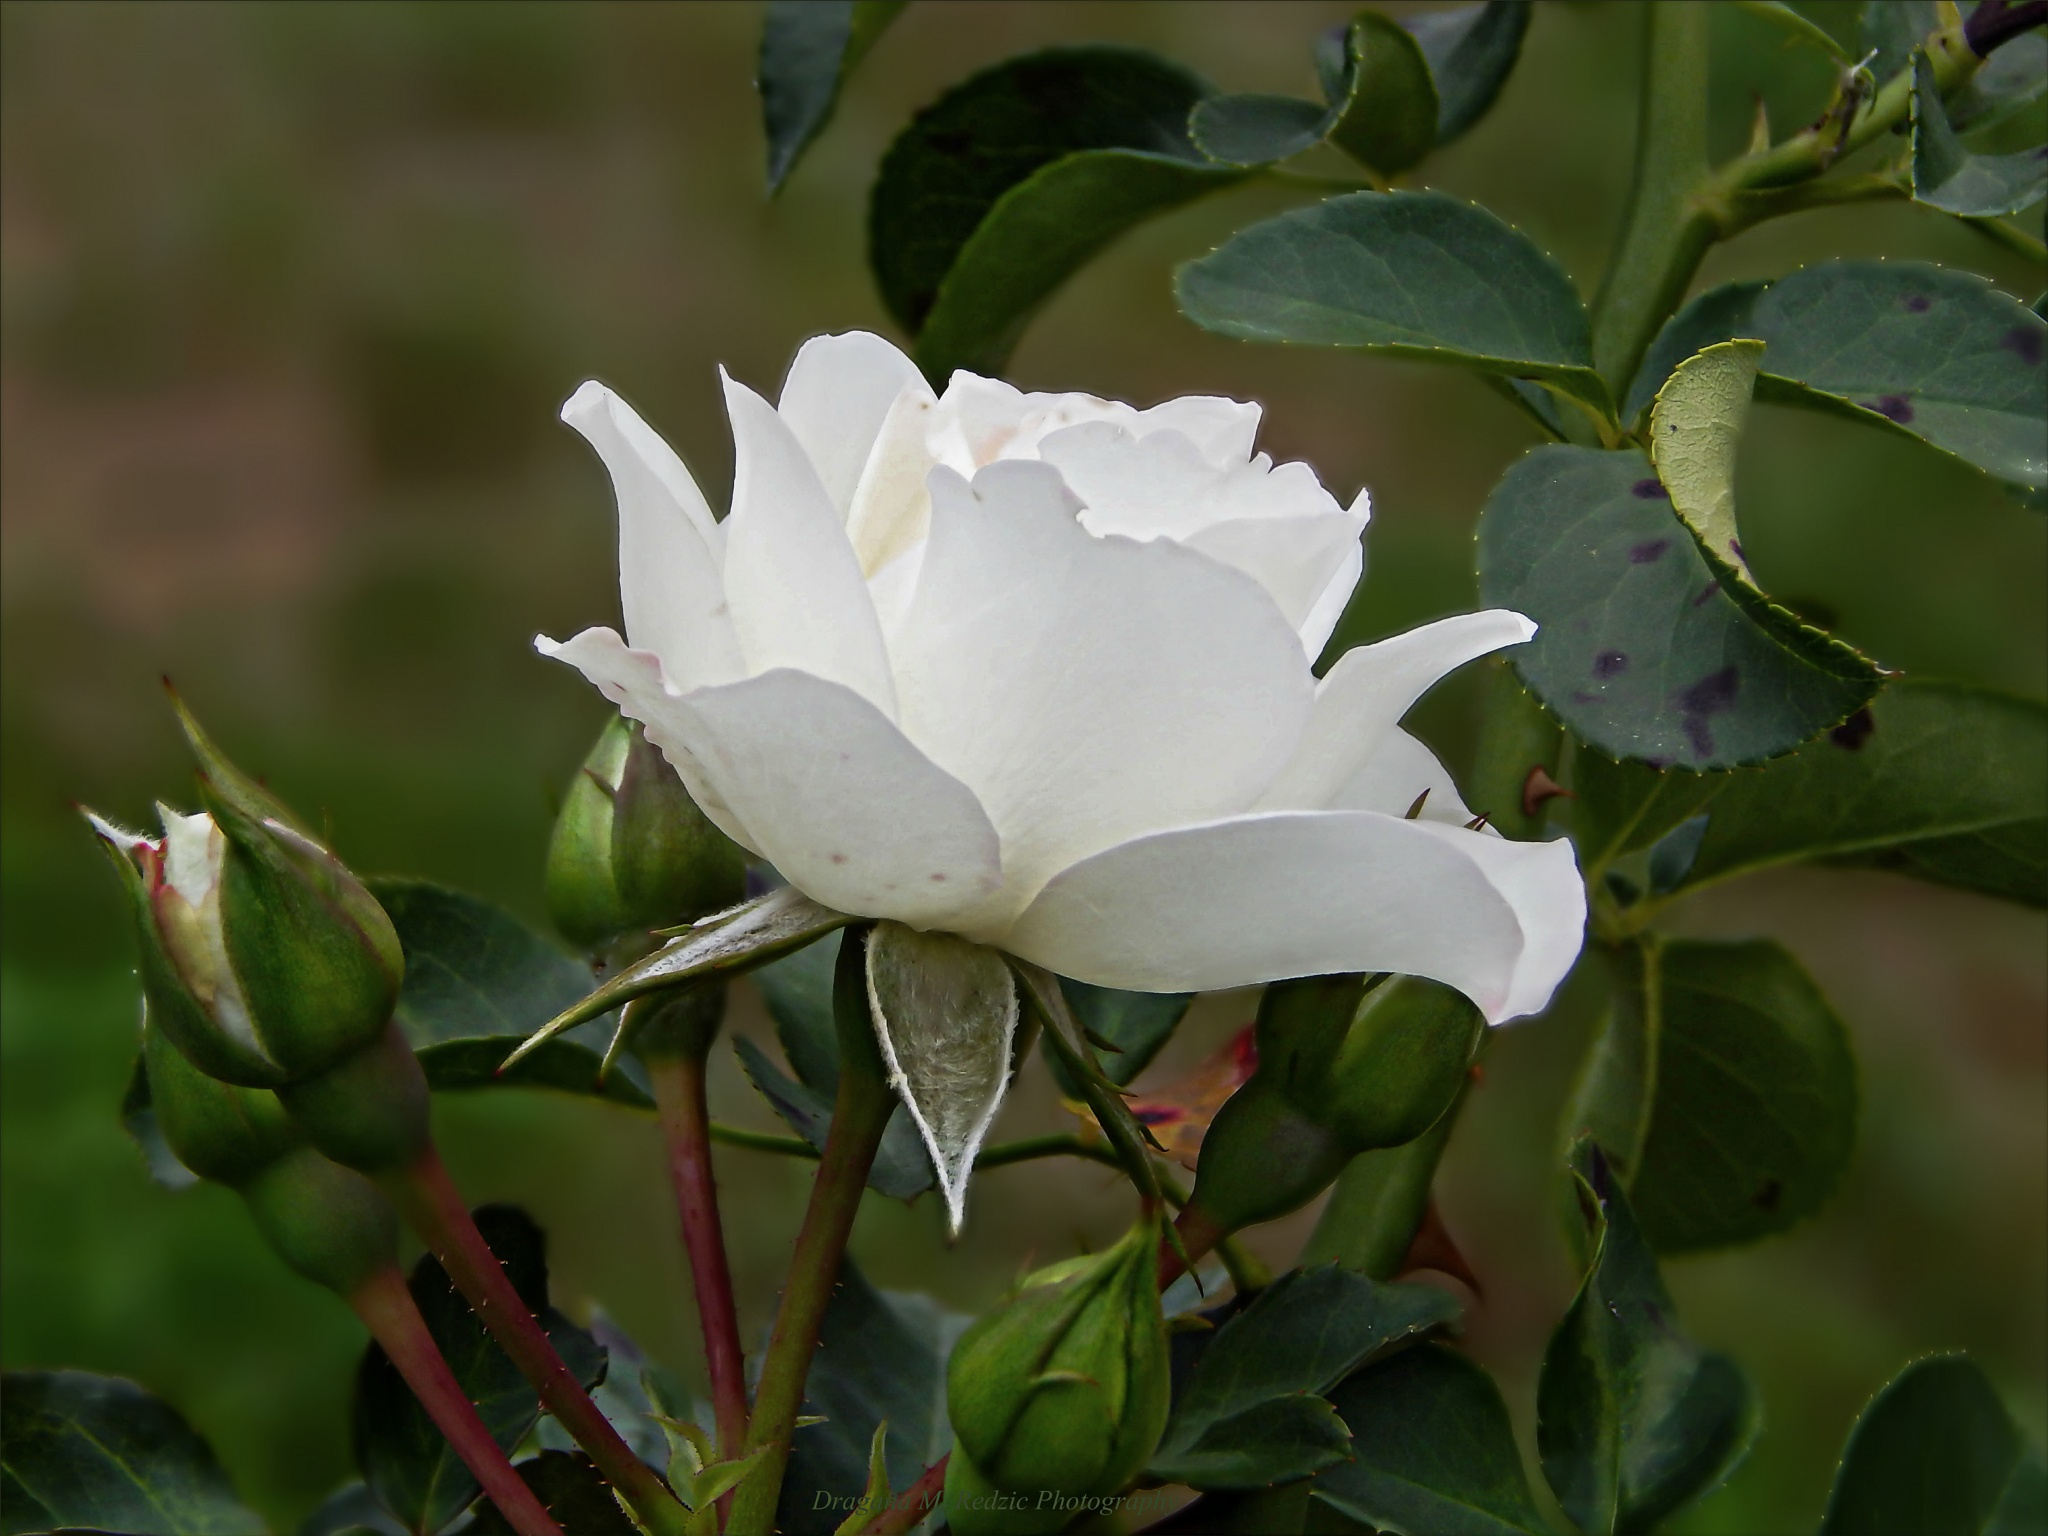 Rosa alba L. ~ White rose ~ Bela ruža by Драгана М. Реџић